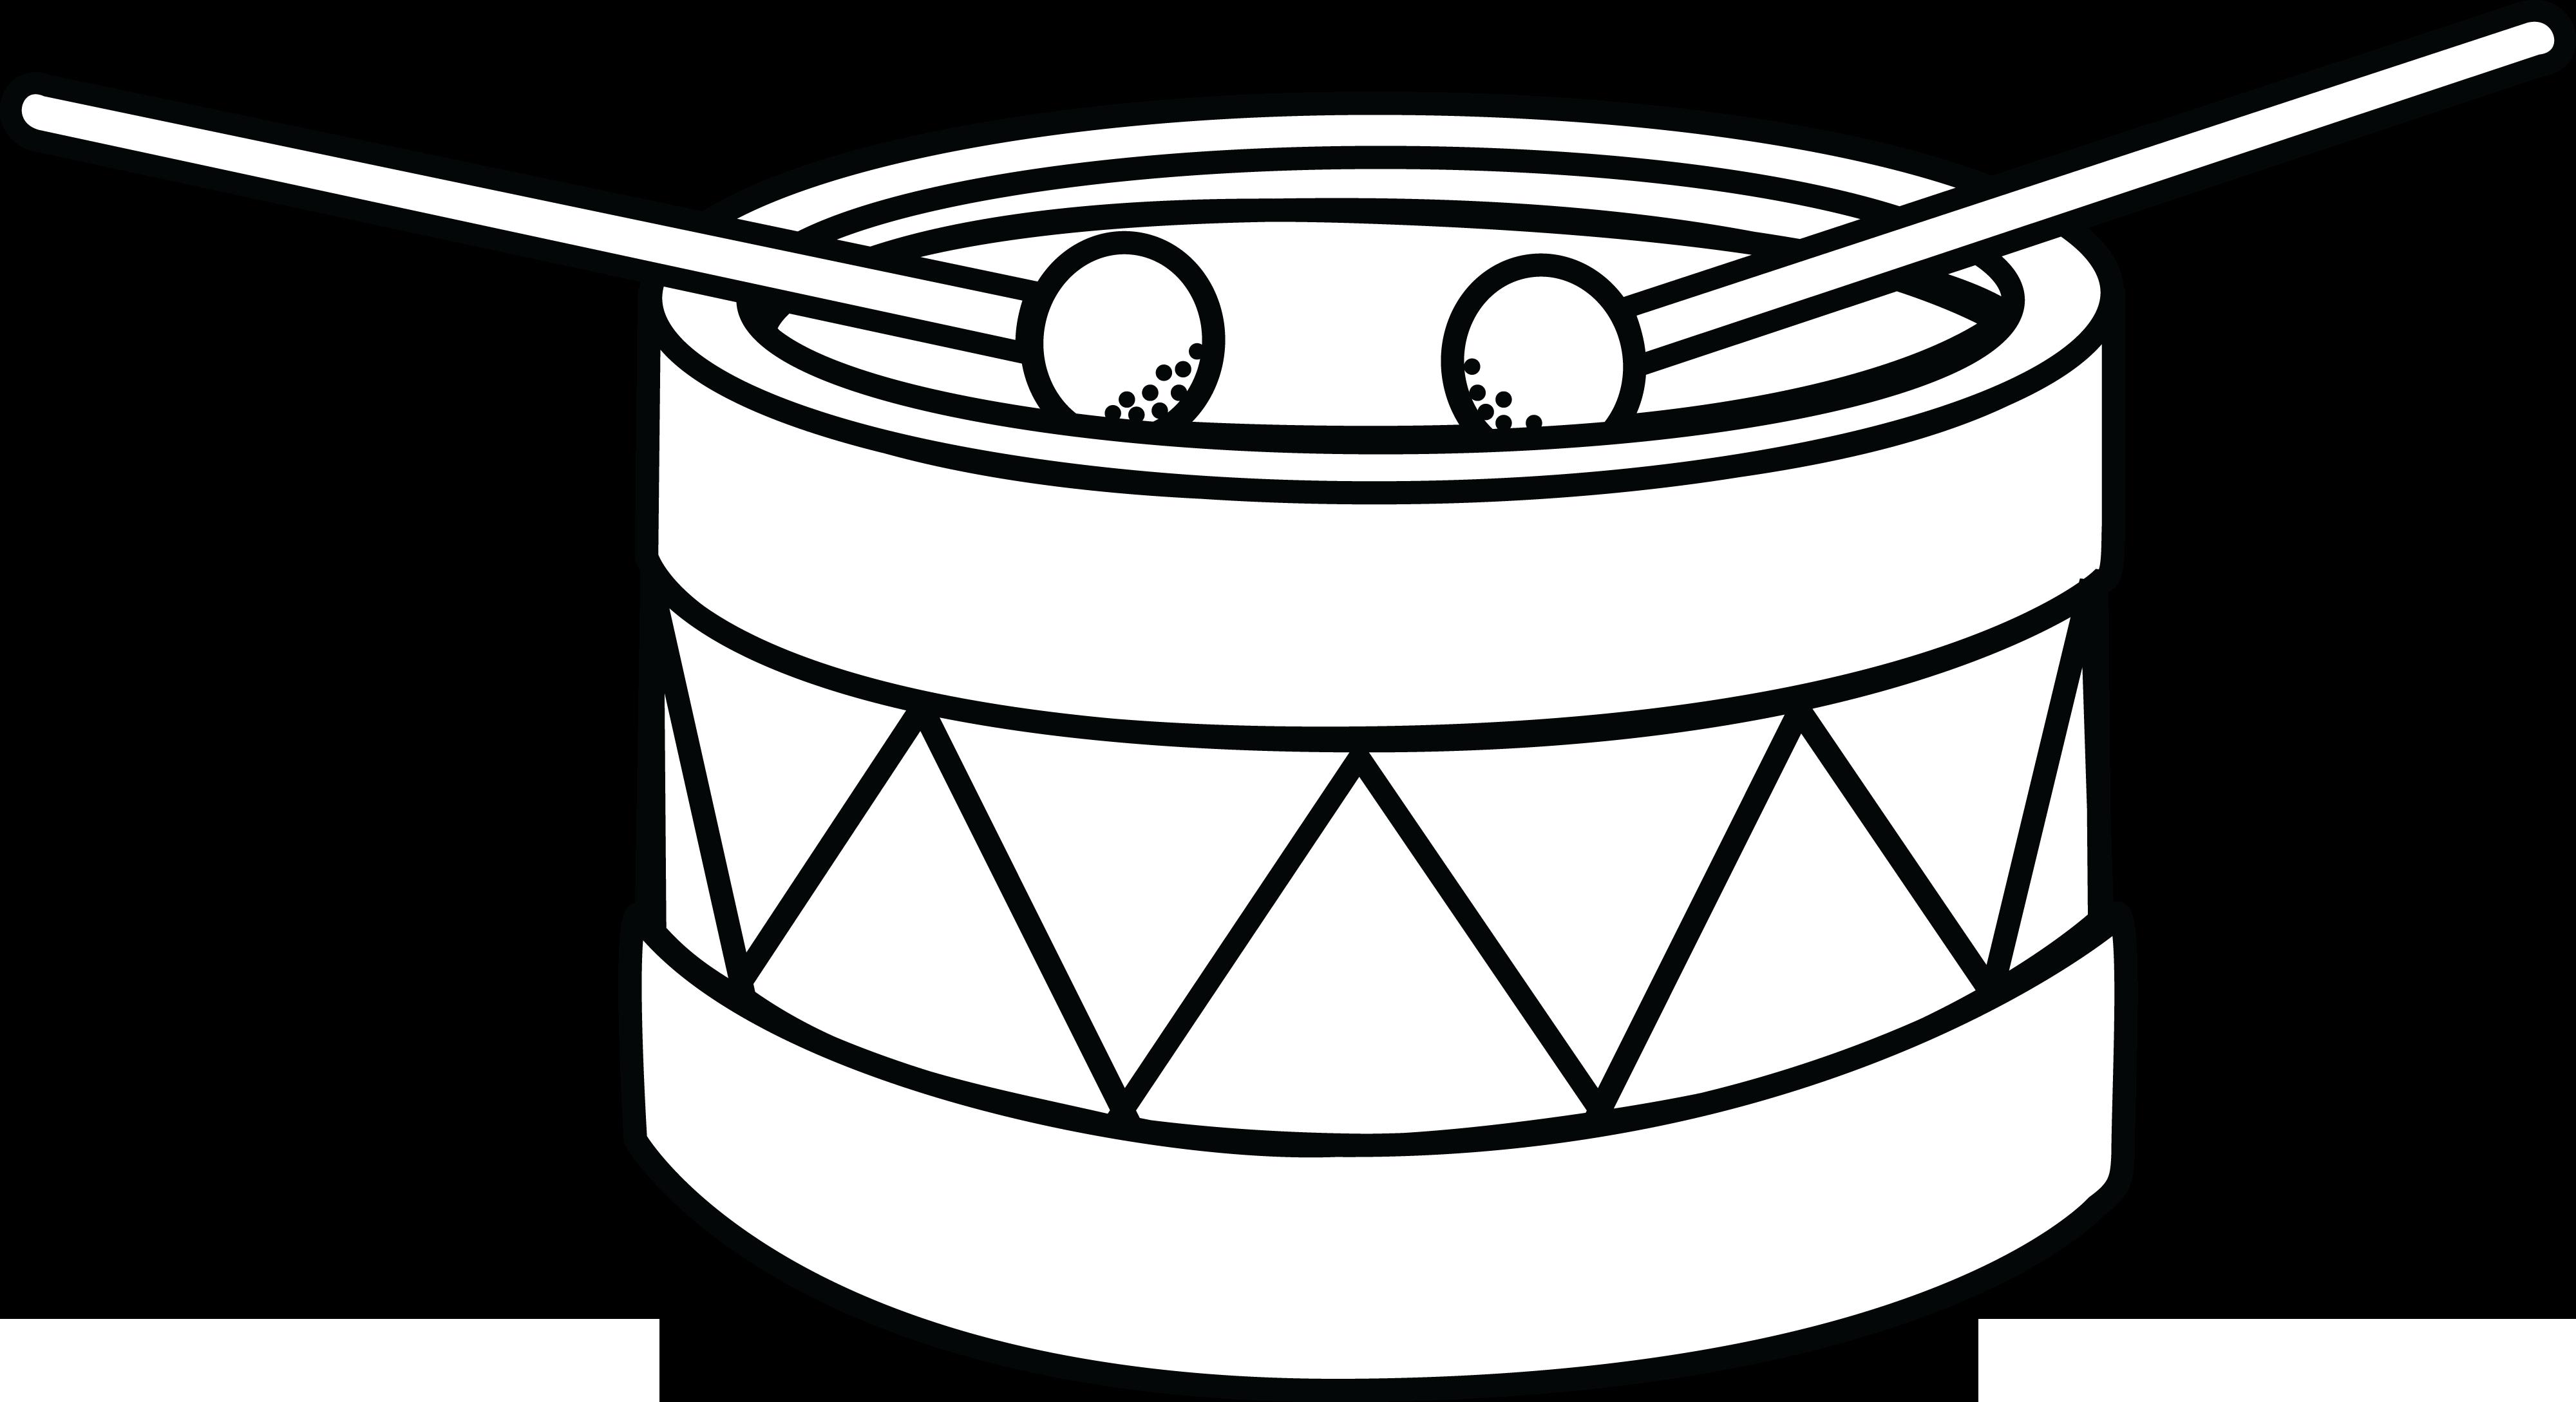 free clipart of a drum rh free clipartof com drum clip art free drum images clipart